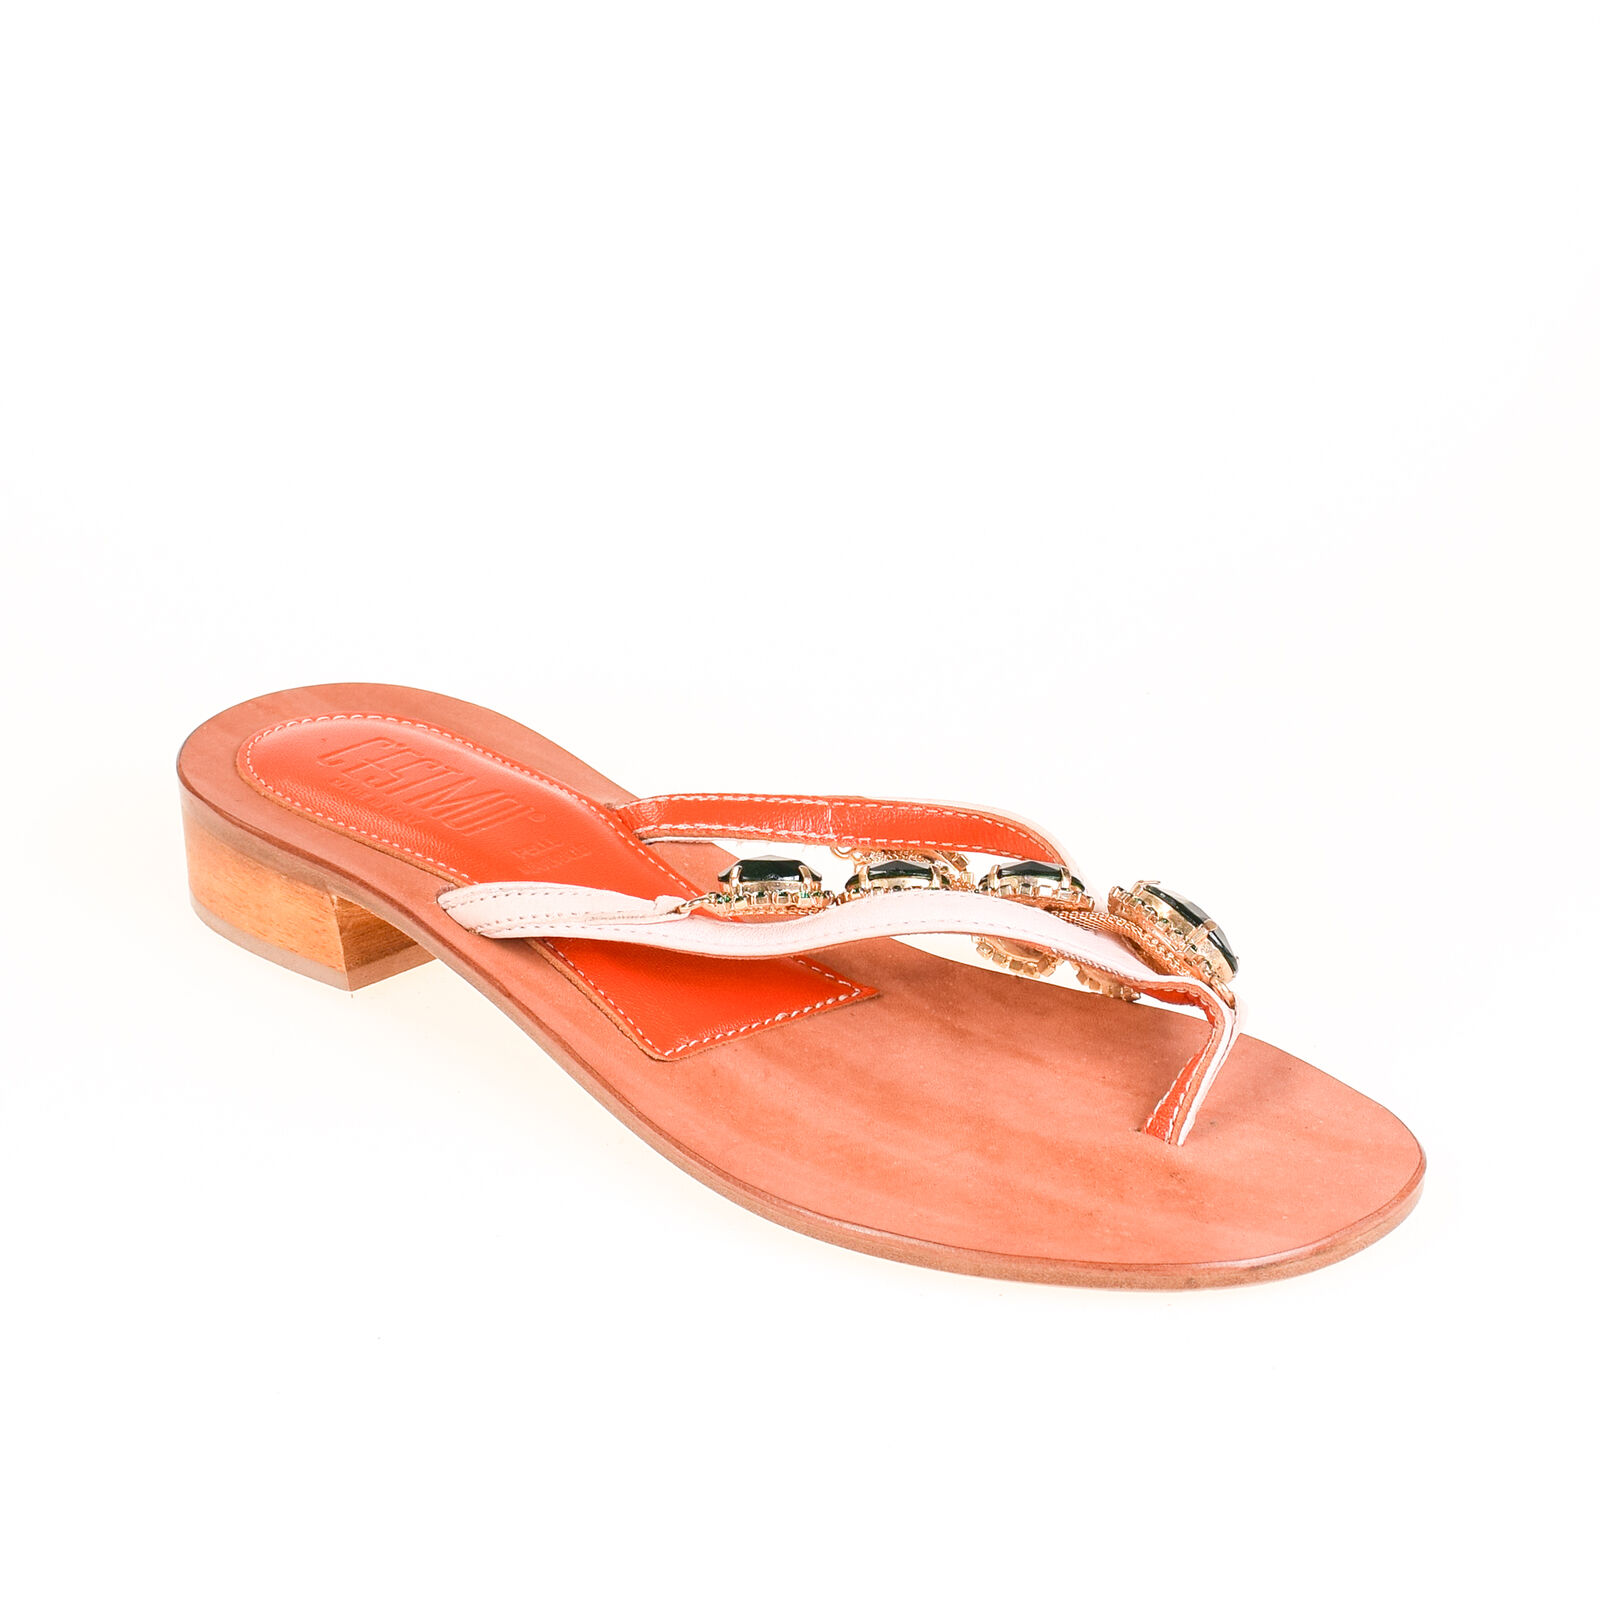 Último gran descuento C'est Moi Damen Sandale Leder Orange Rosa Grün